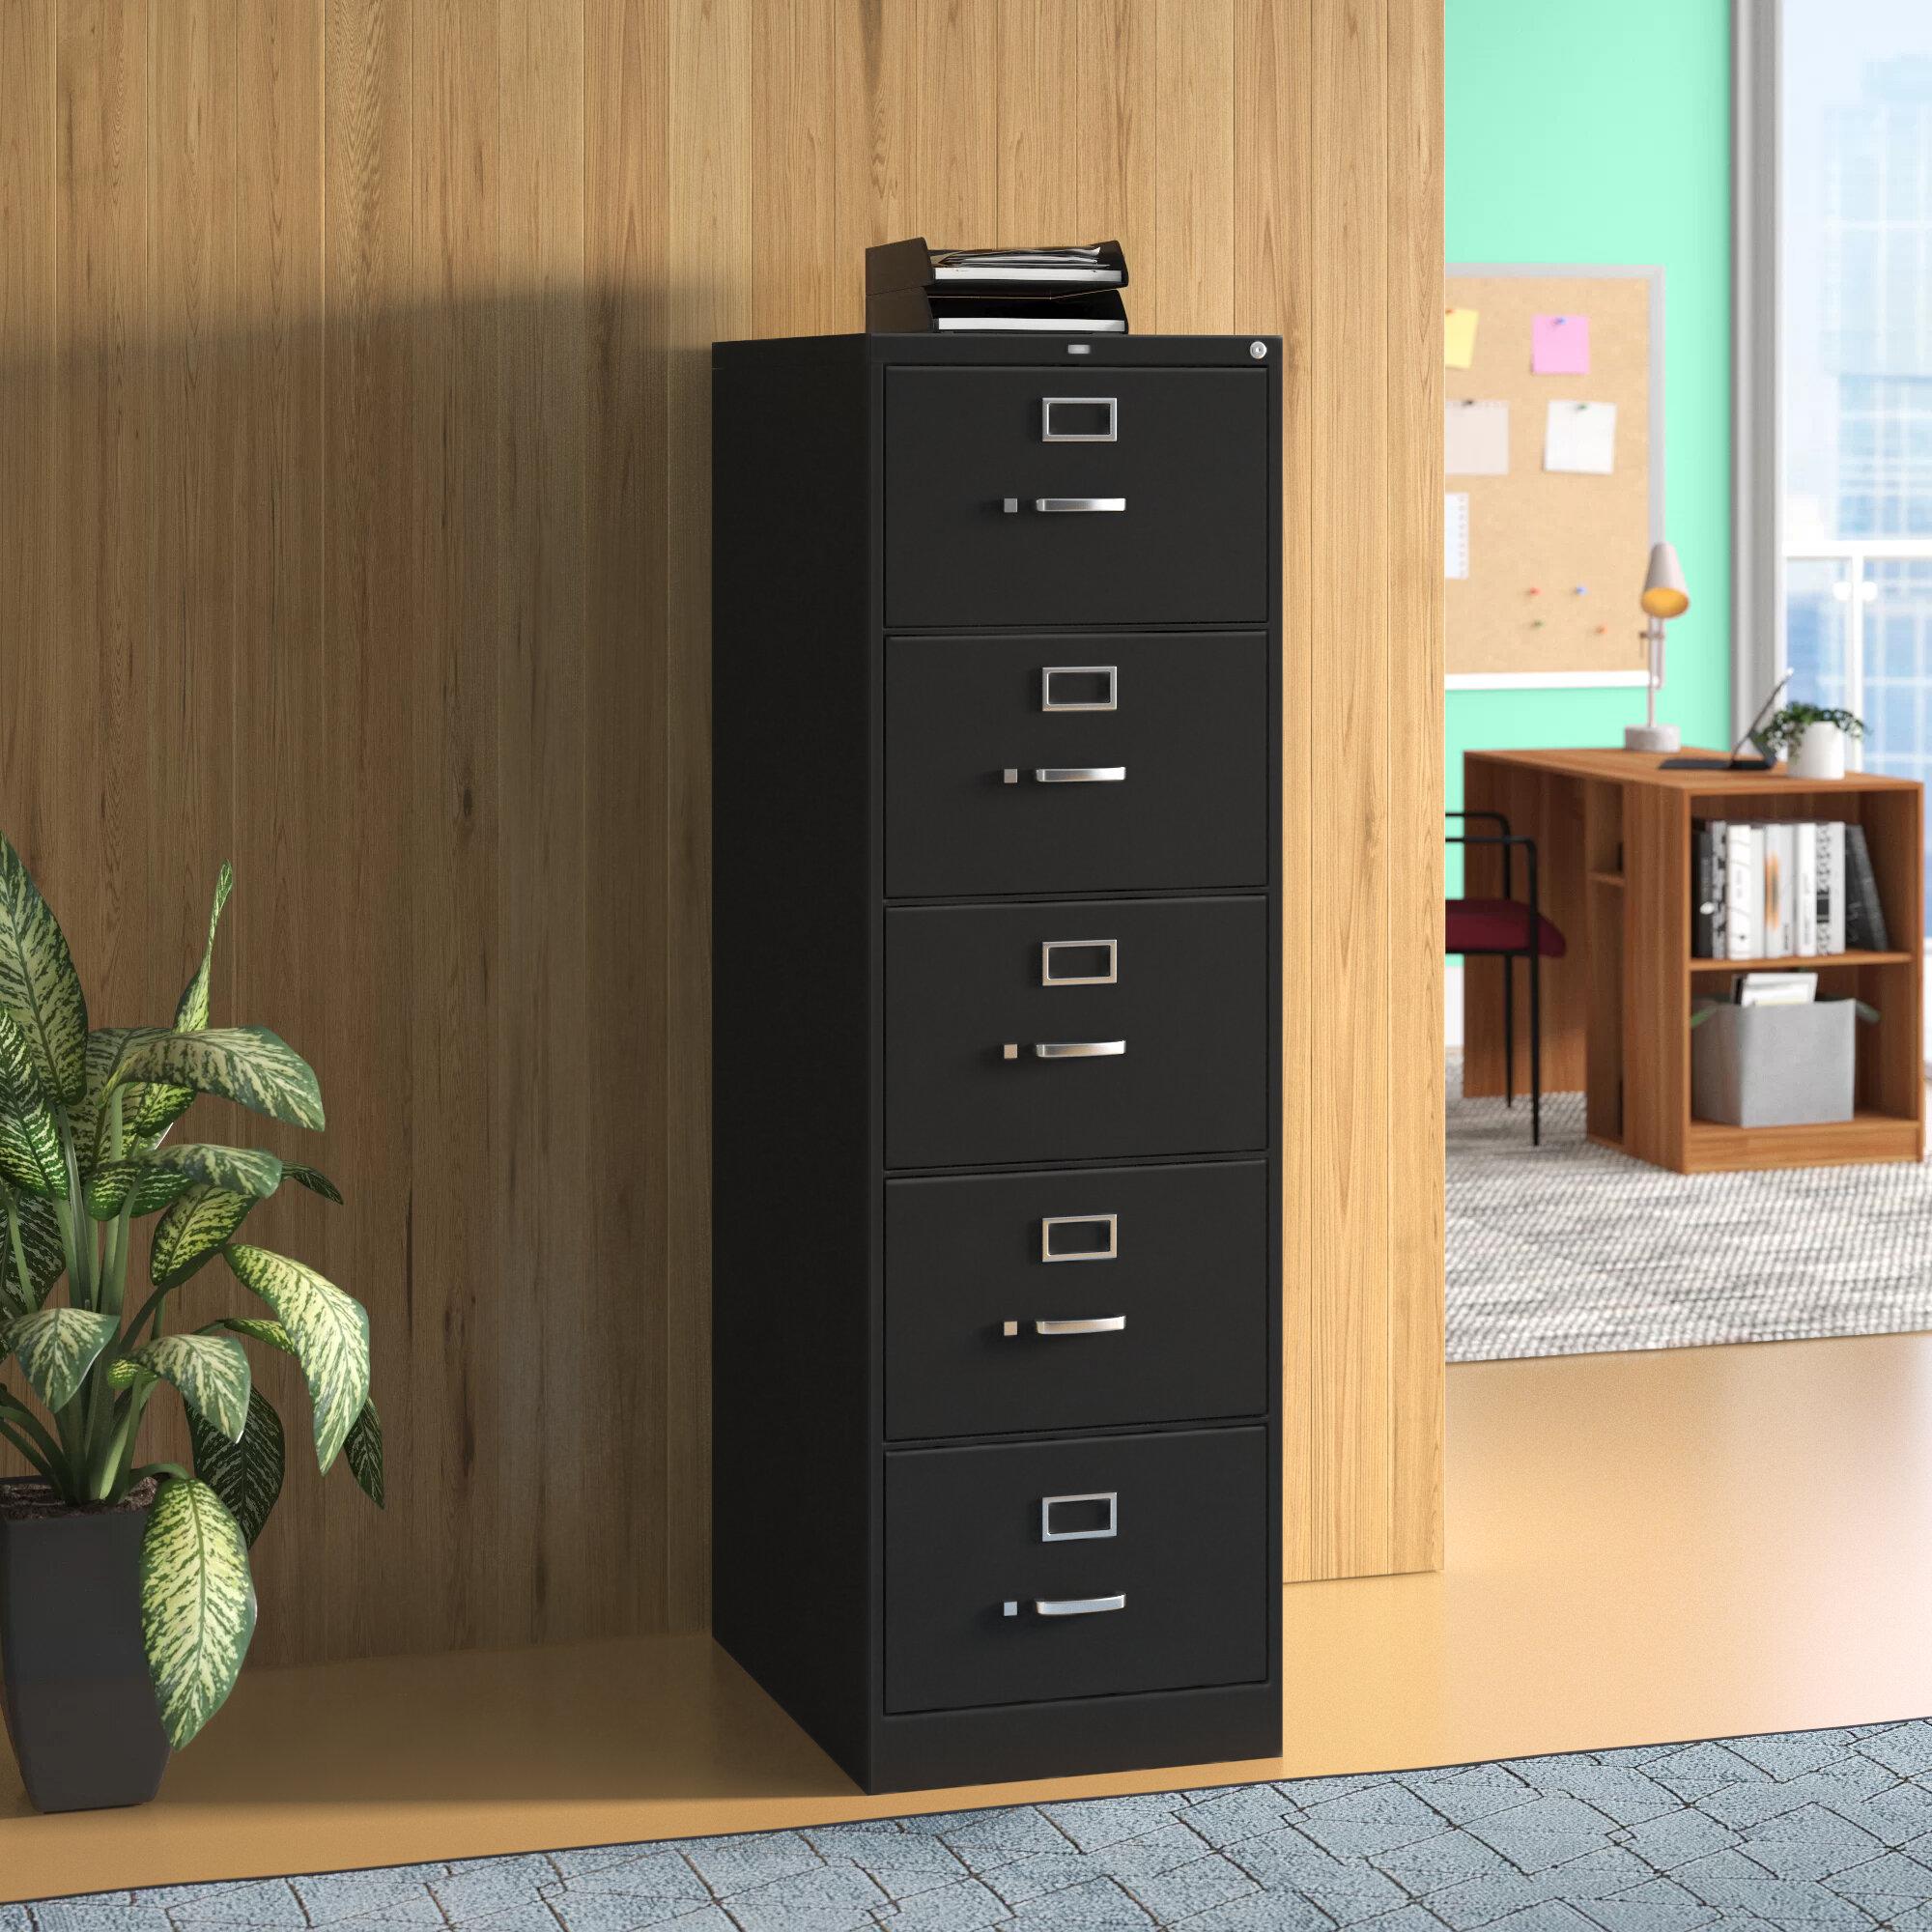 Hon 310 Series 5 Drawer Vertical Filing Cabinet Wayfair